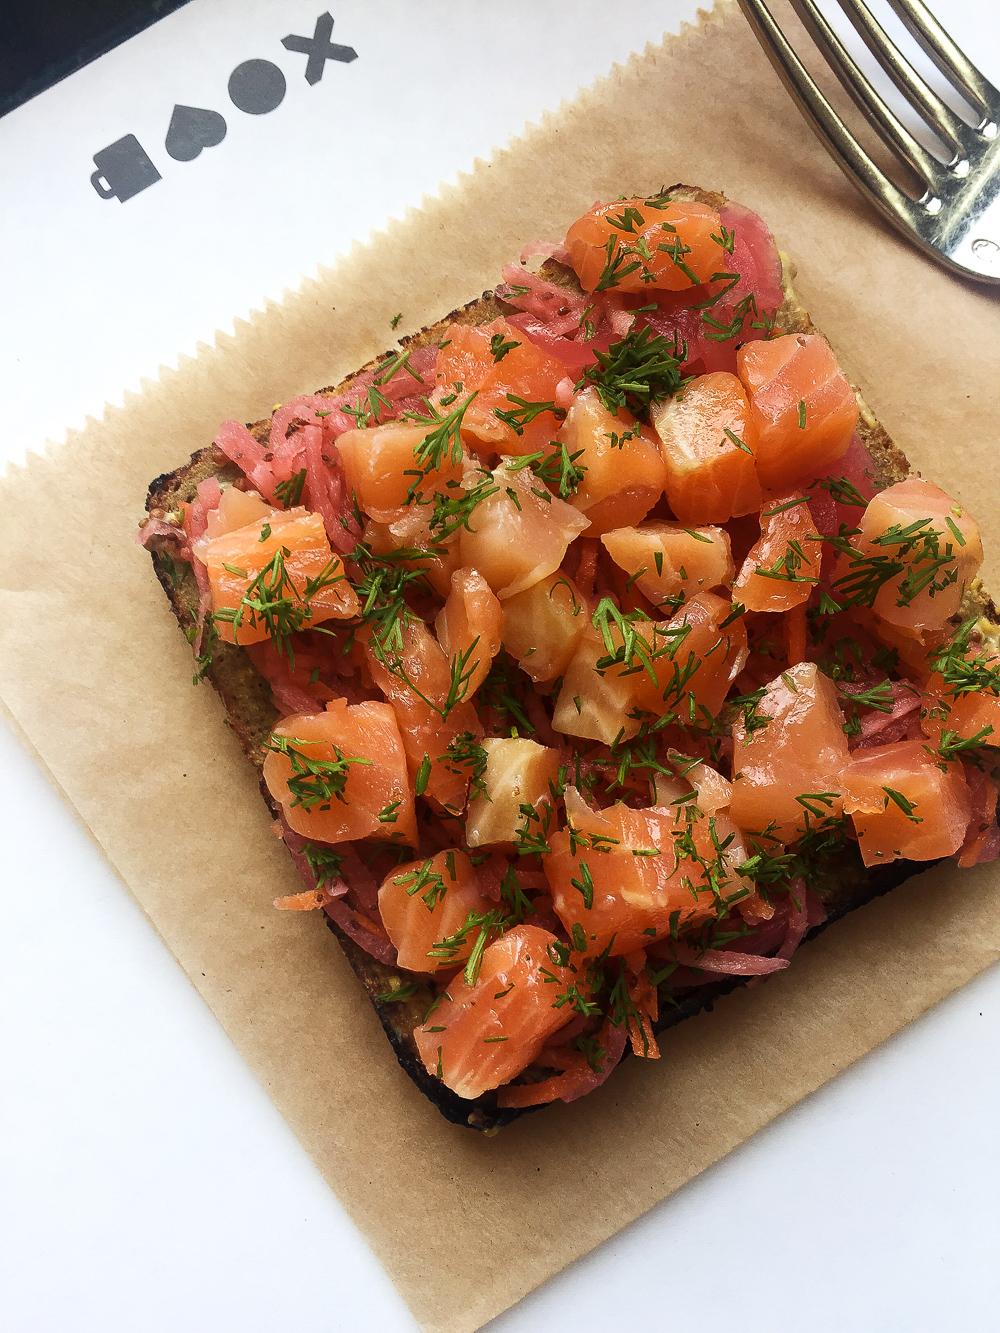 Smoked Salmon Smörgås at The Bachelor Farmer Cafe